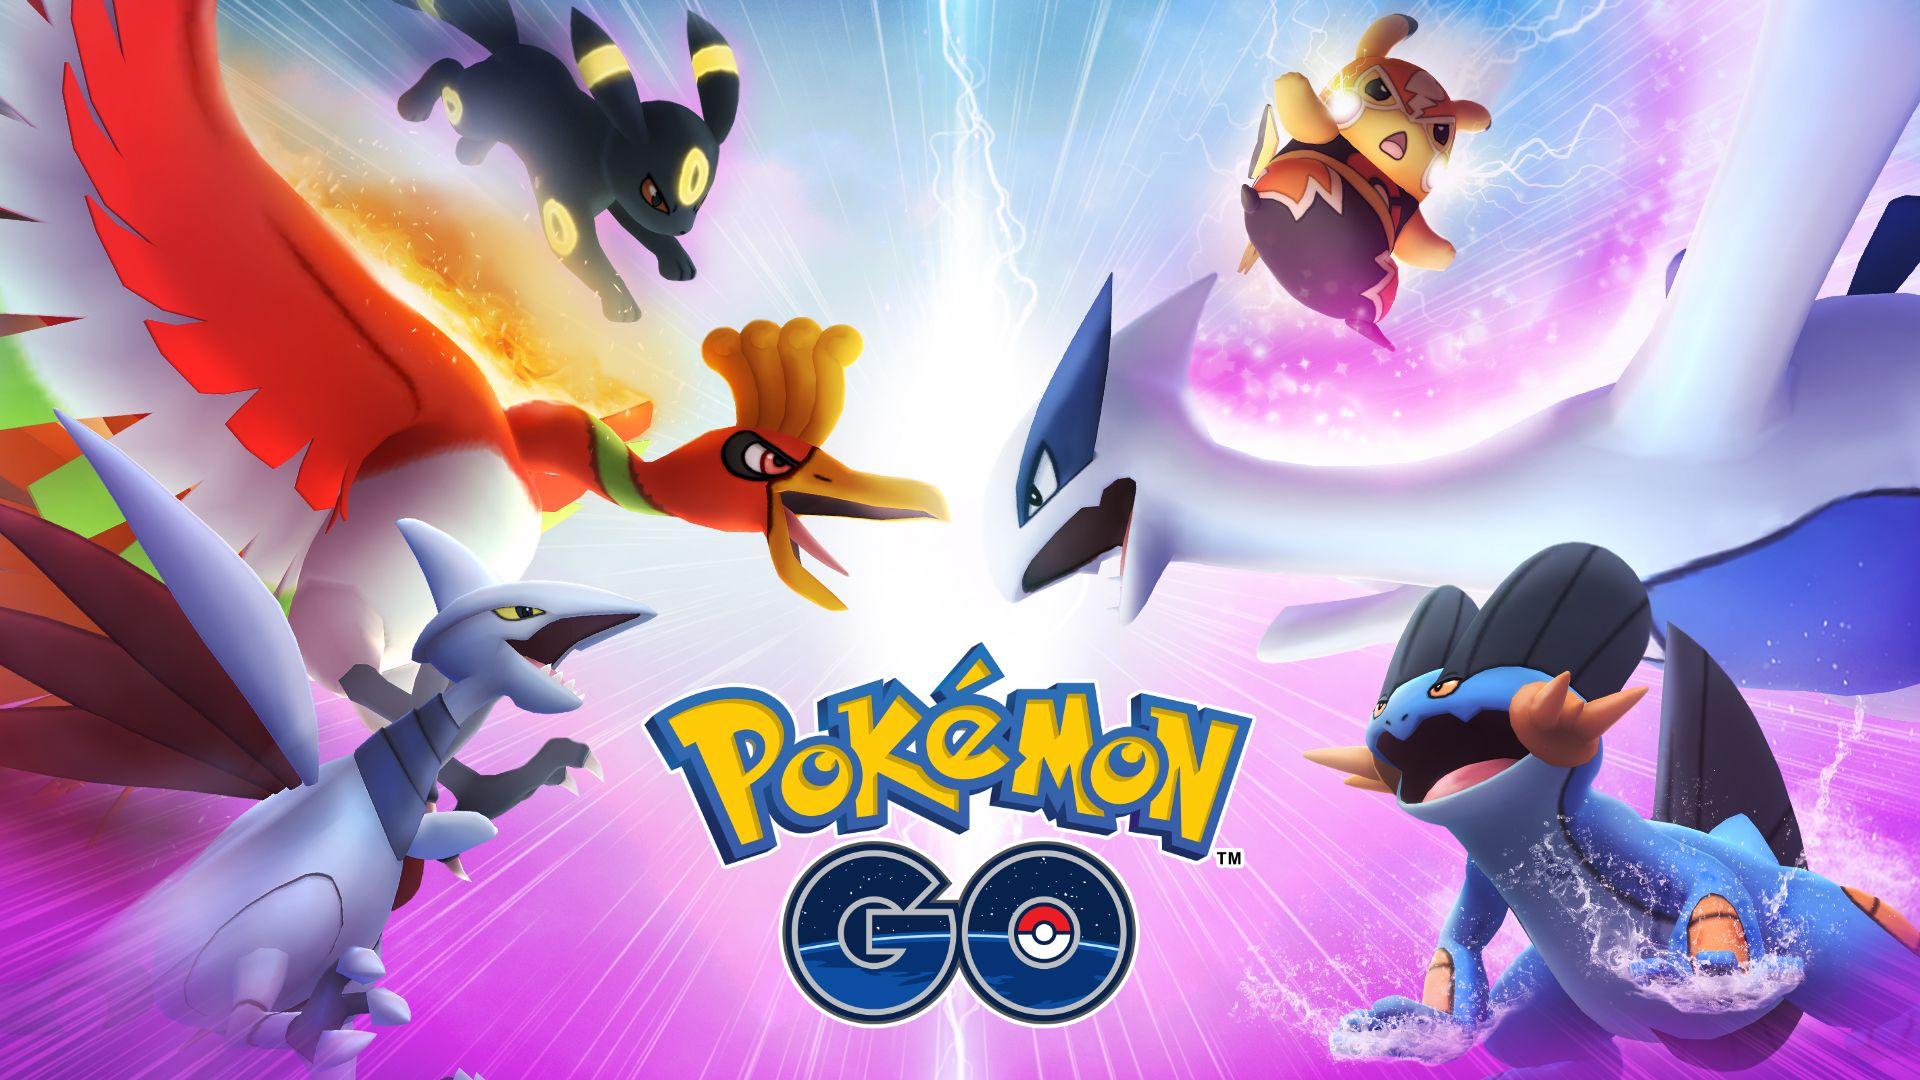 Pokemon Go Ultra League best team The top Pokemon to use